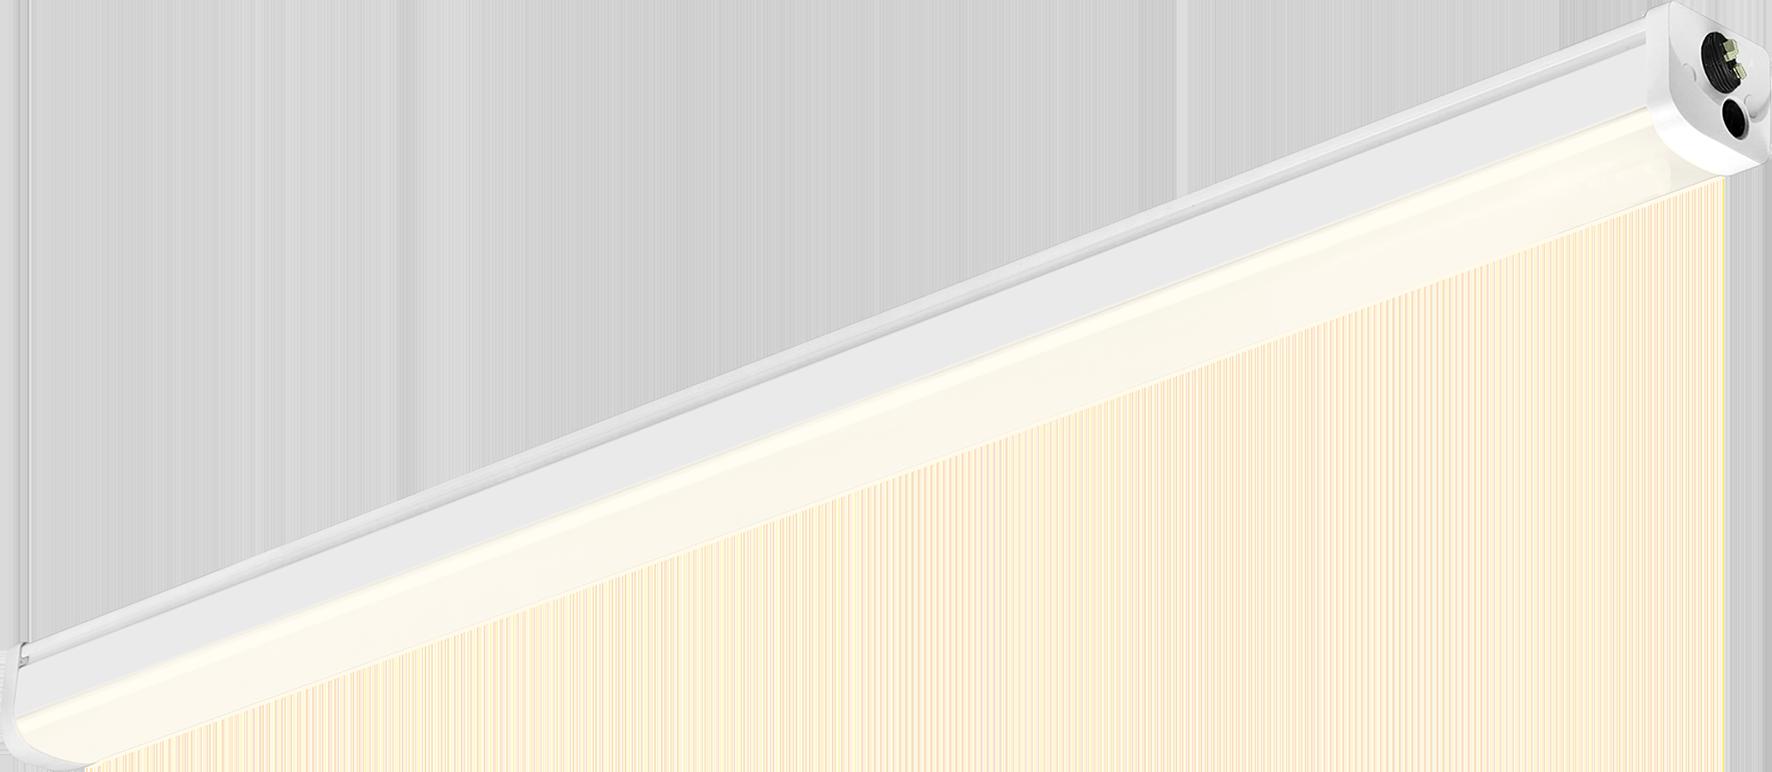 licatec led feuchtraum profilleuchte trendlight led. Black Bedroom Furniture Sets. Home Design Ideas